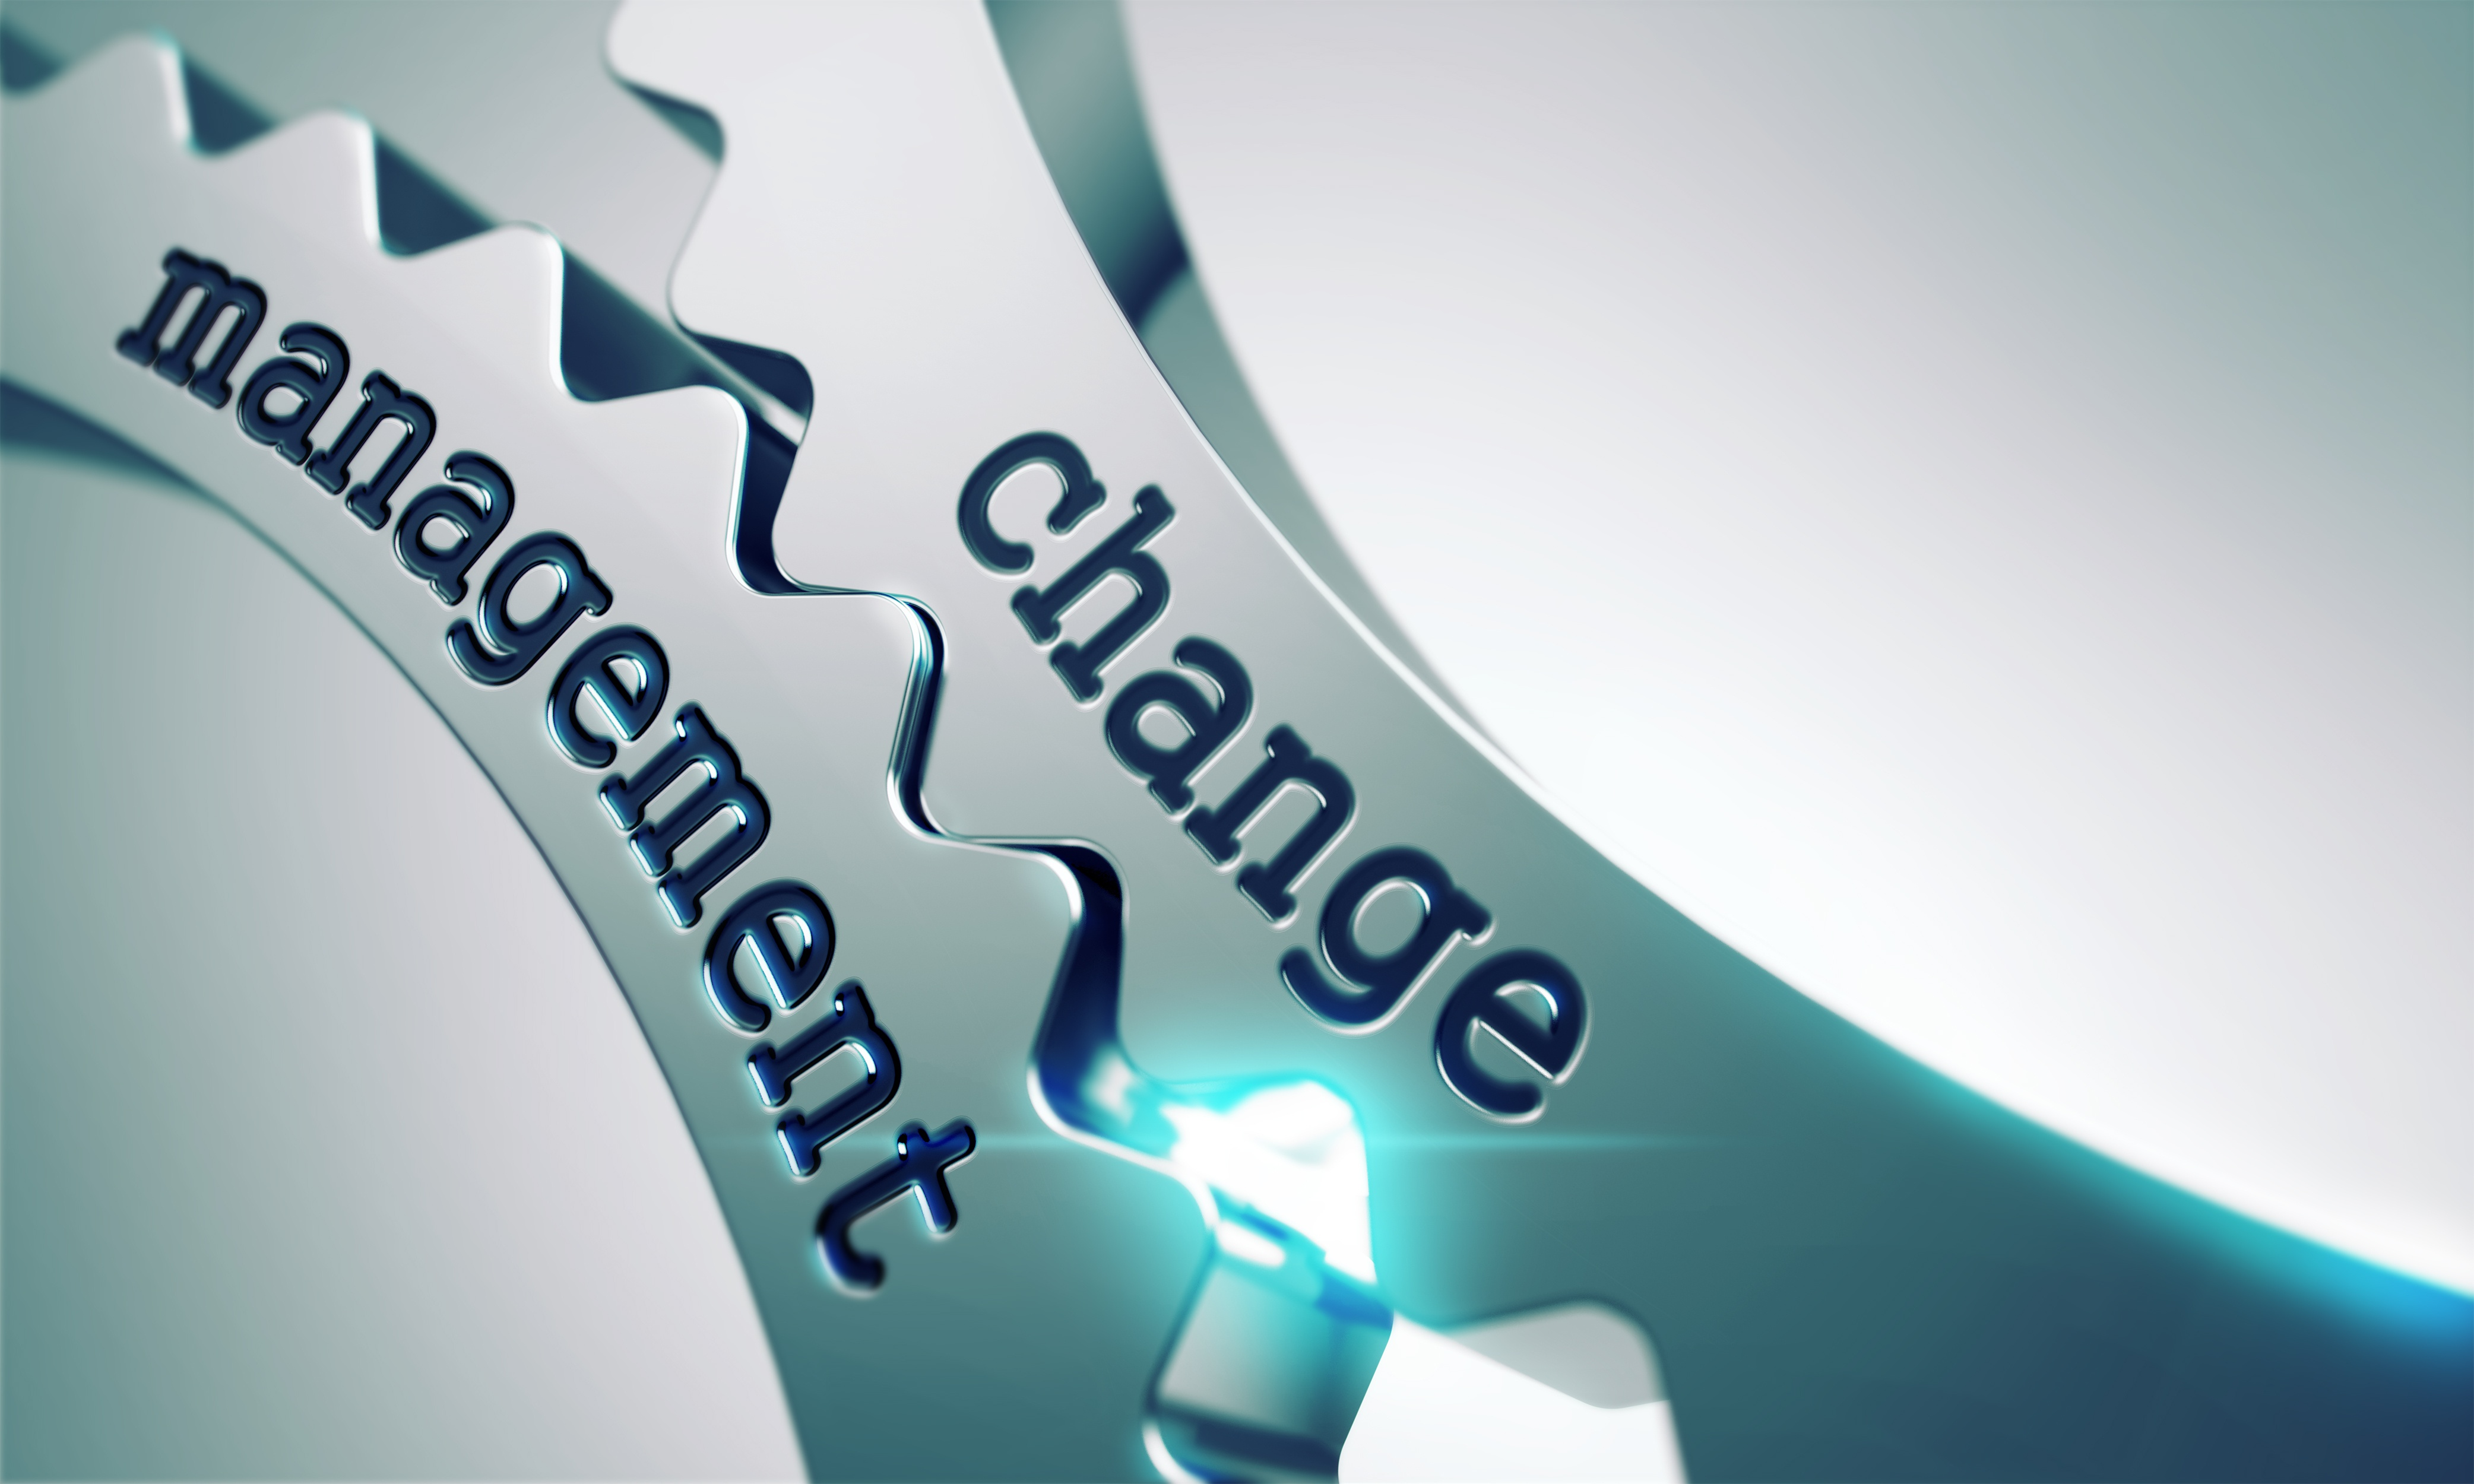 Change Management Gears